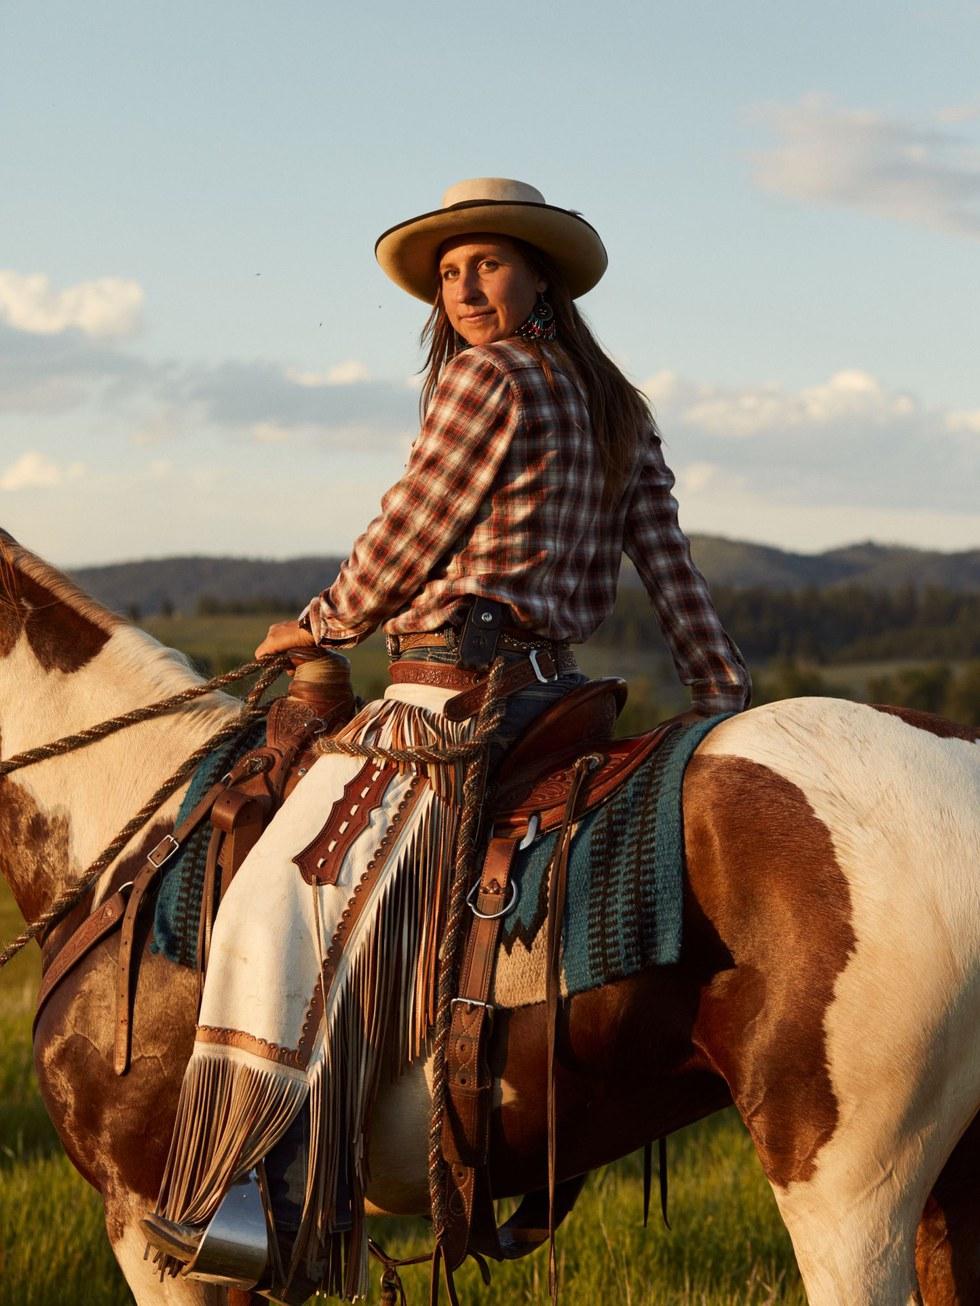 Jackie Kecskes, cattle wrangler